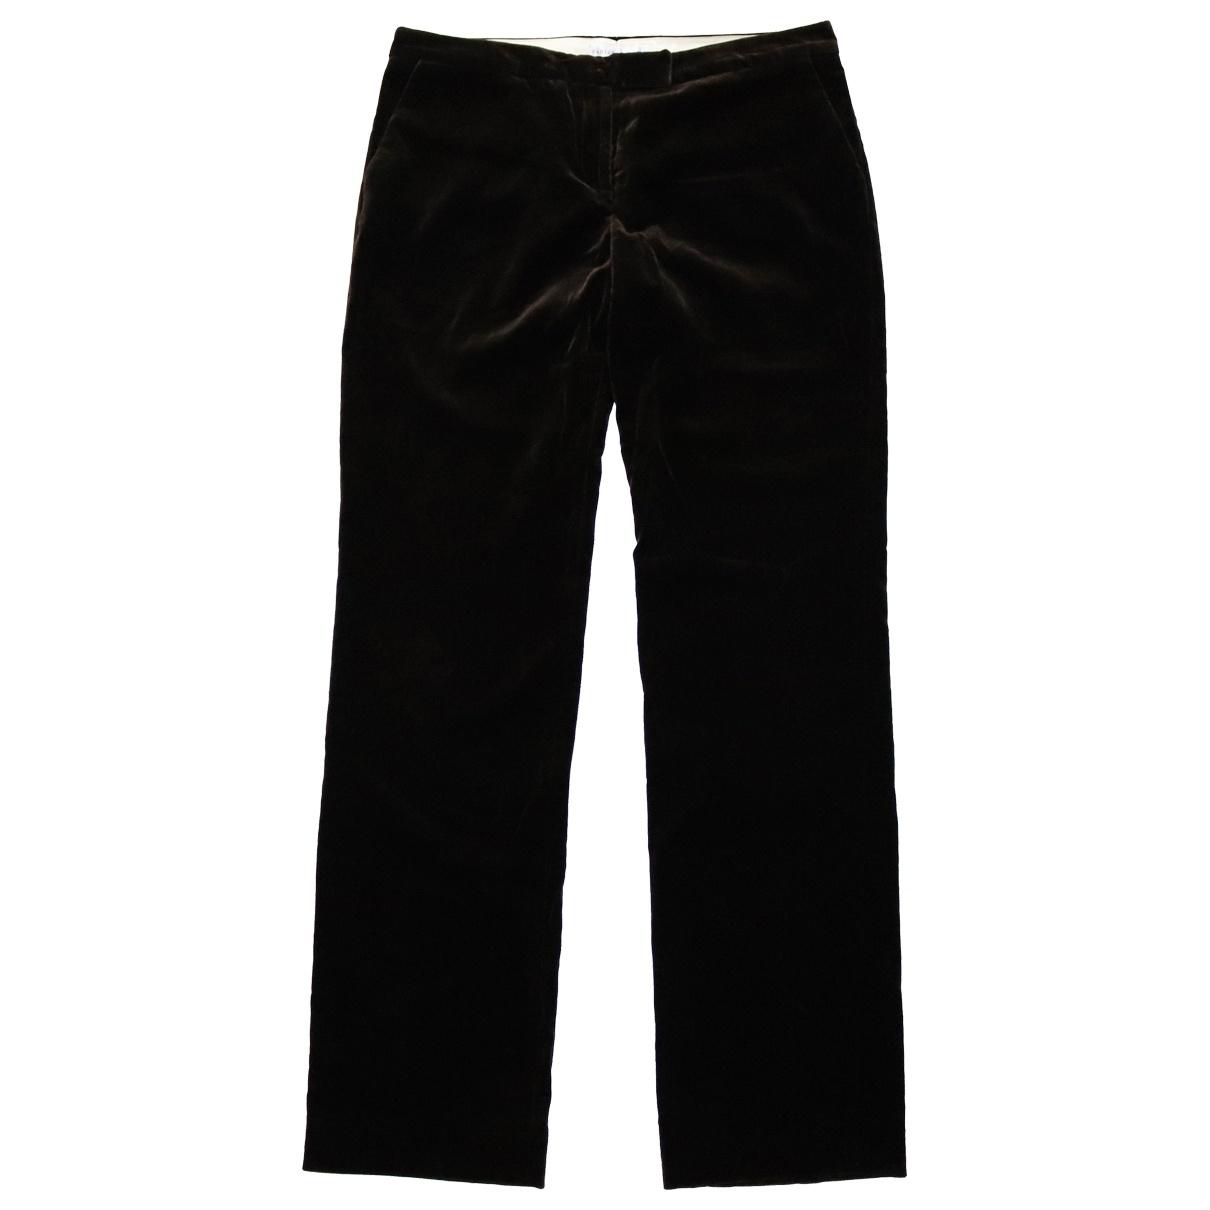 Fabiana Filippi \N Brown Cotton Trousers for Women L International